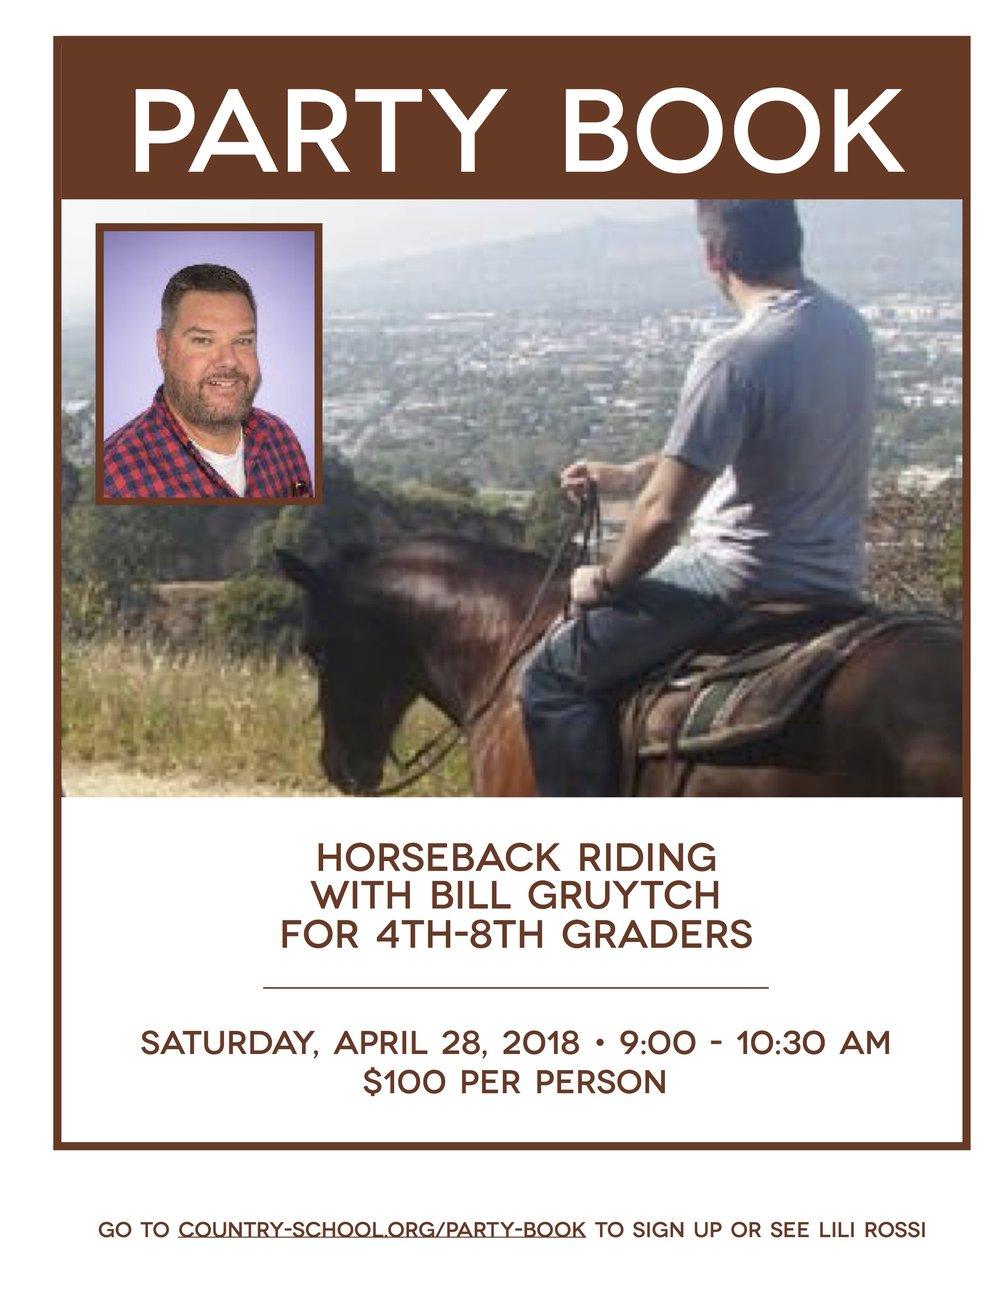 PartyBook_horse_letter.jpg